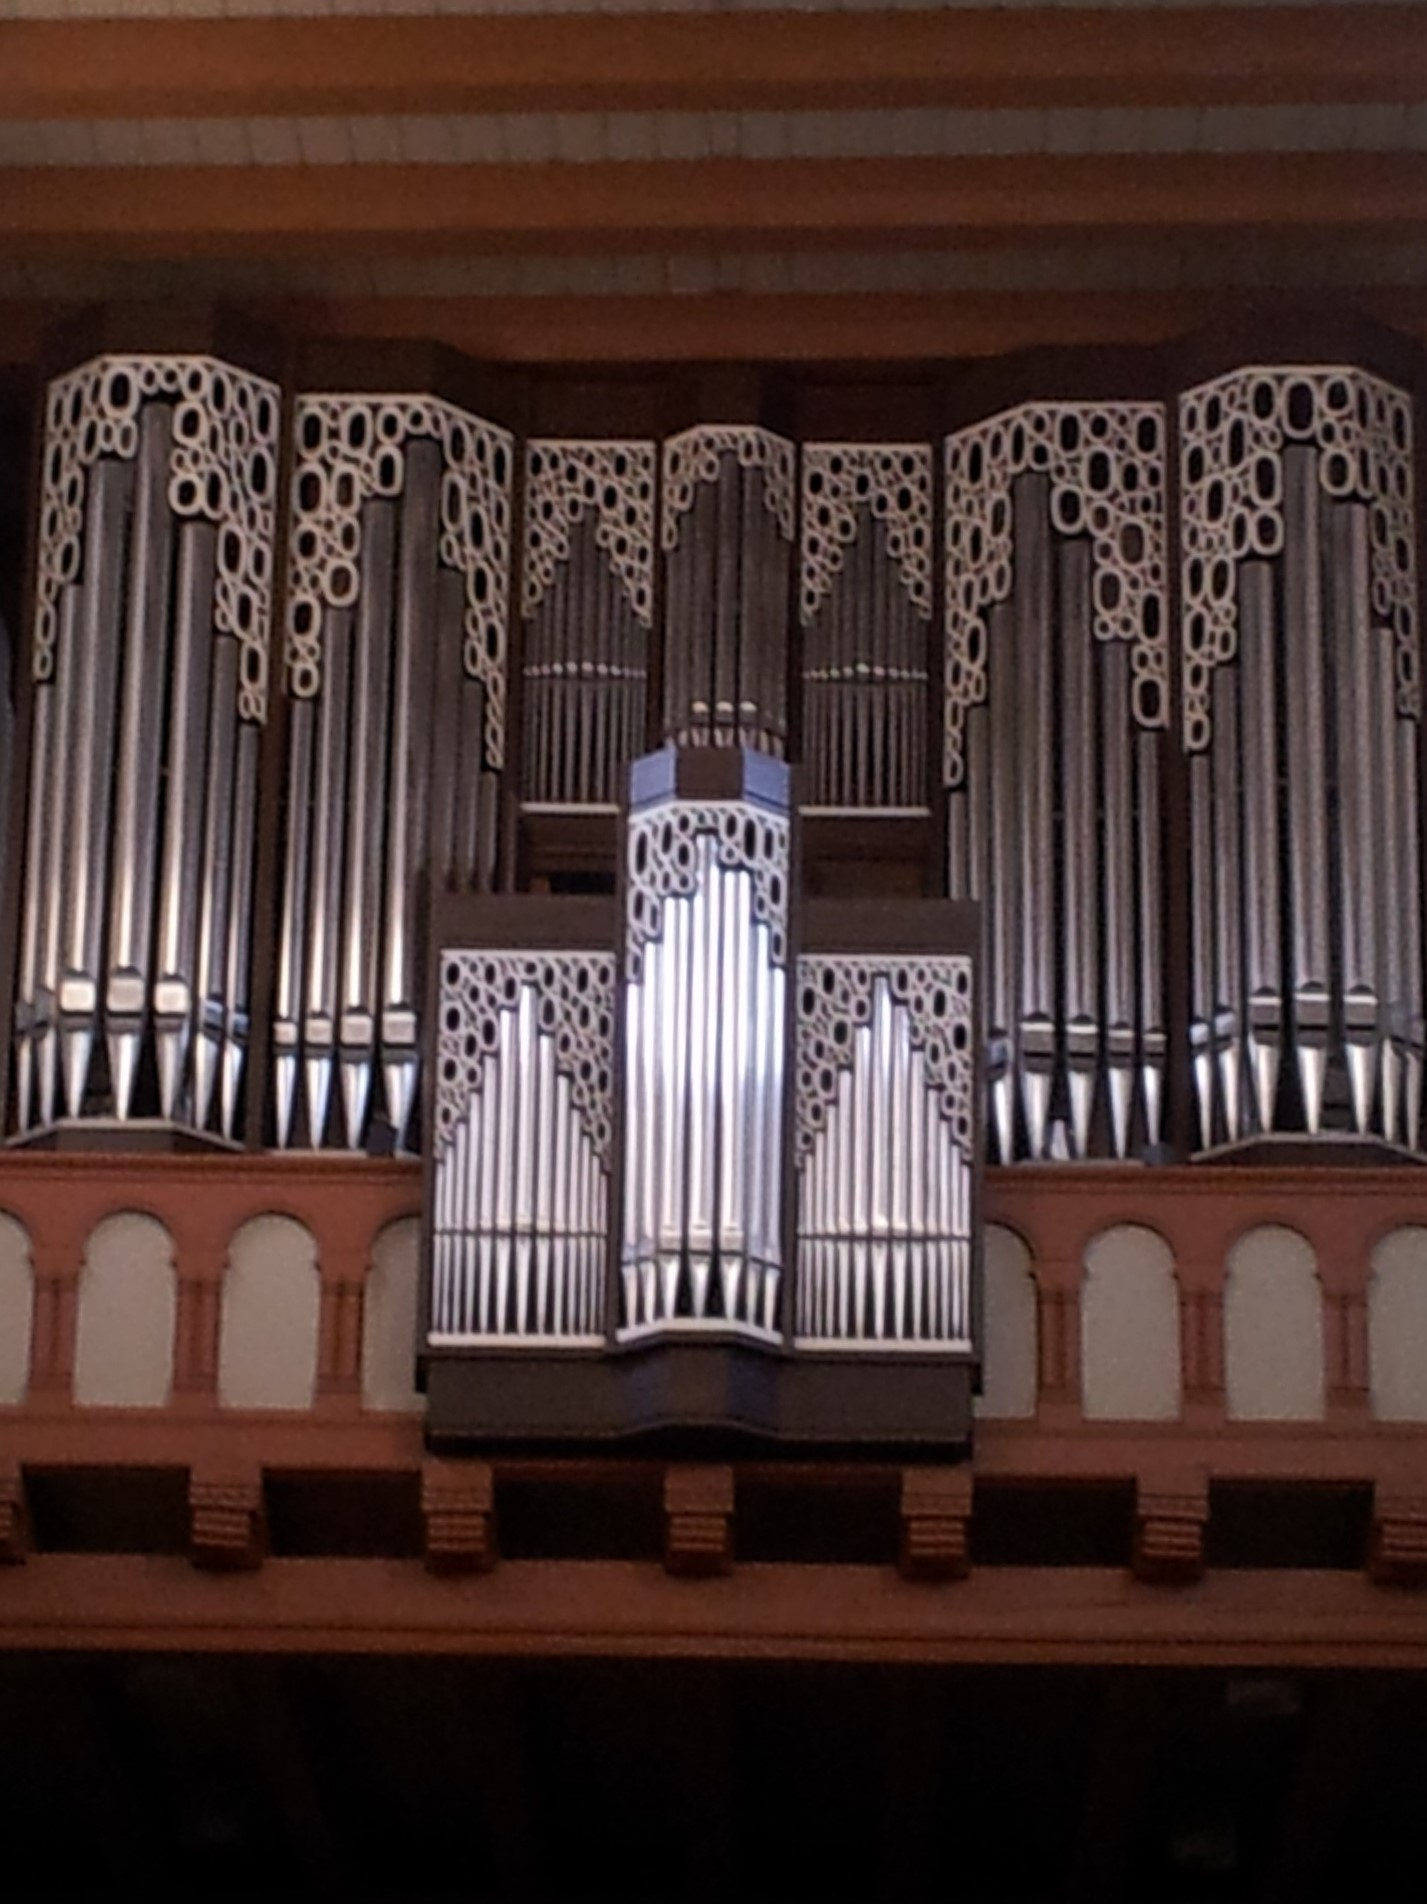 Rudolf-Janke-Orgel Bad Pyrmont